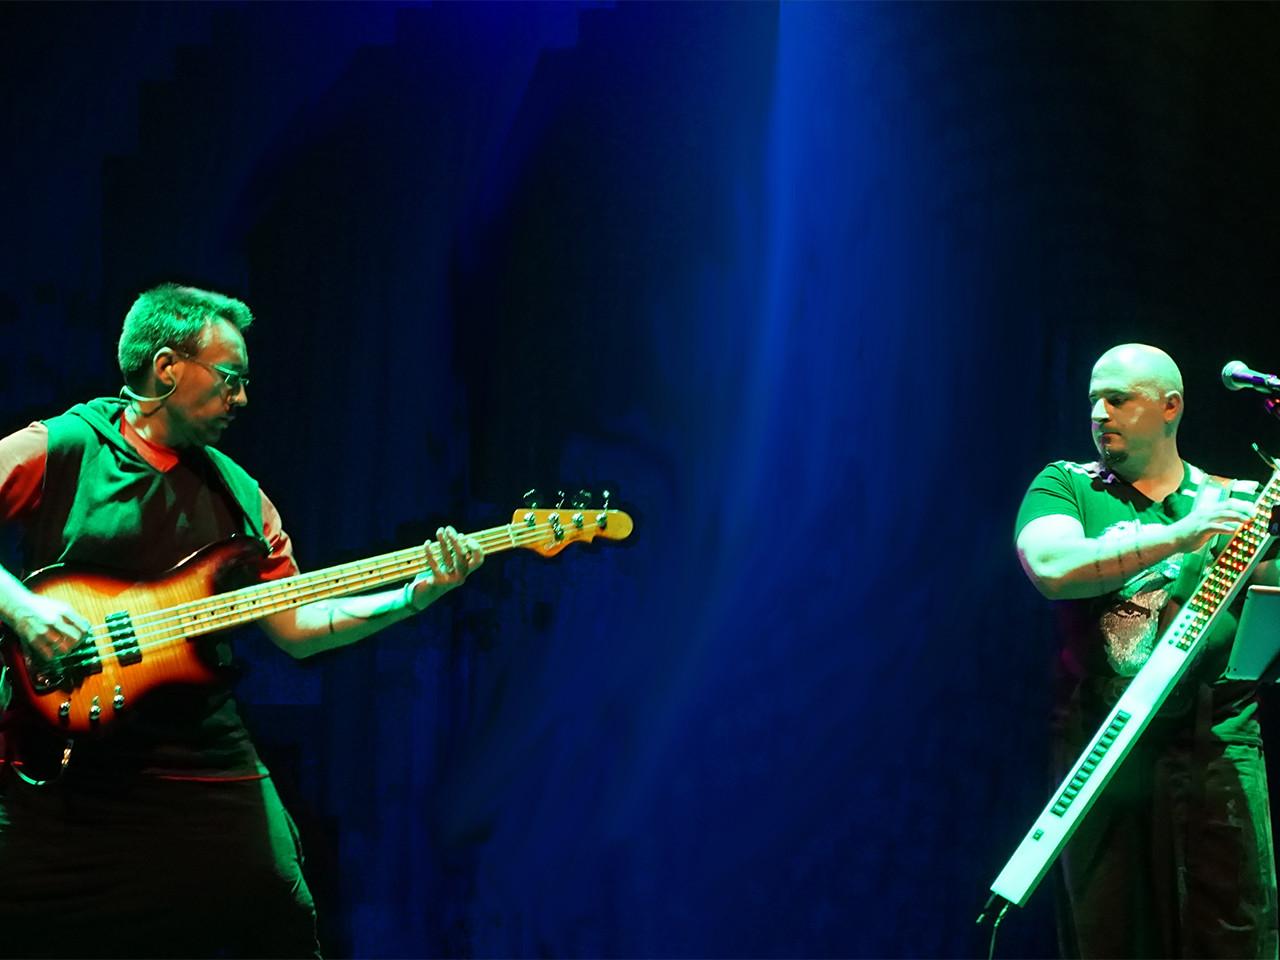 Zoppa Live (with Sebastian Torrella)